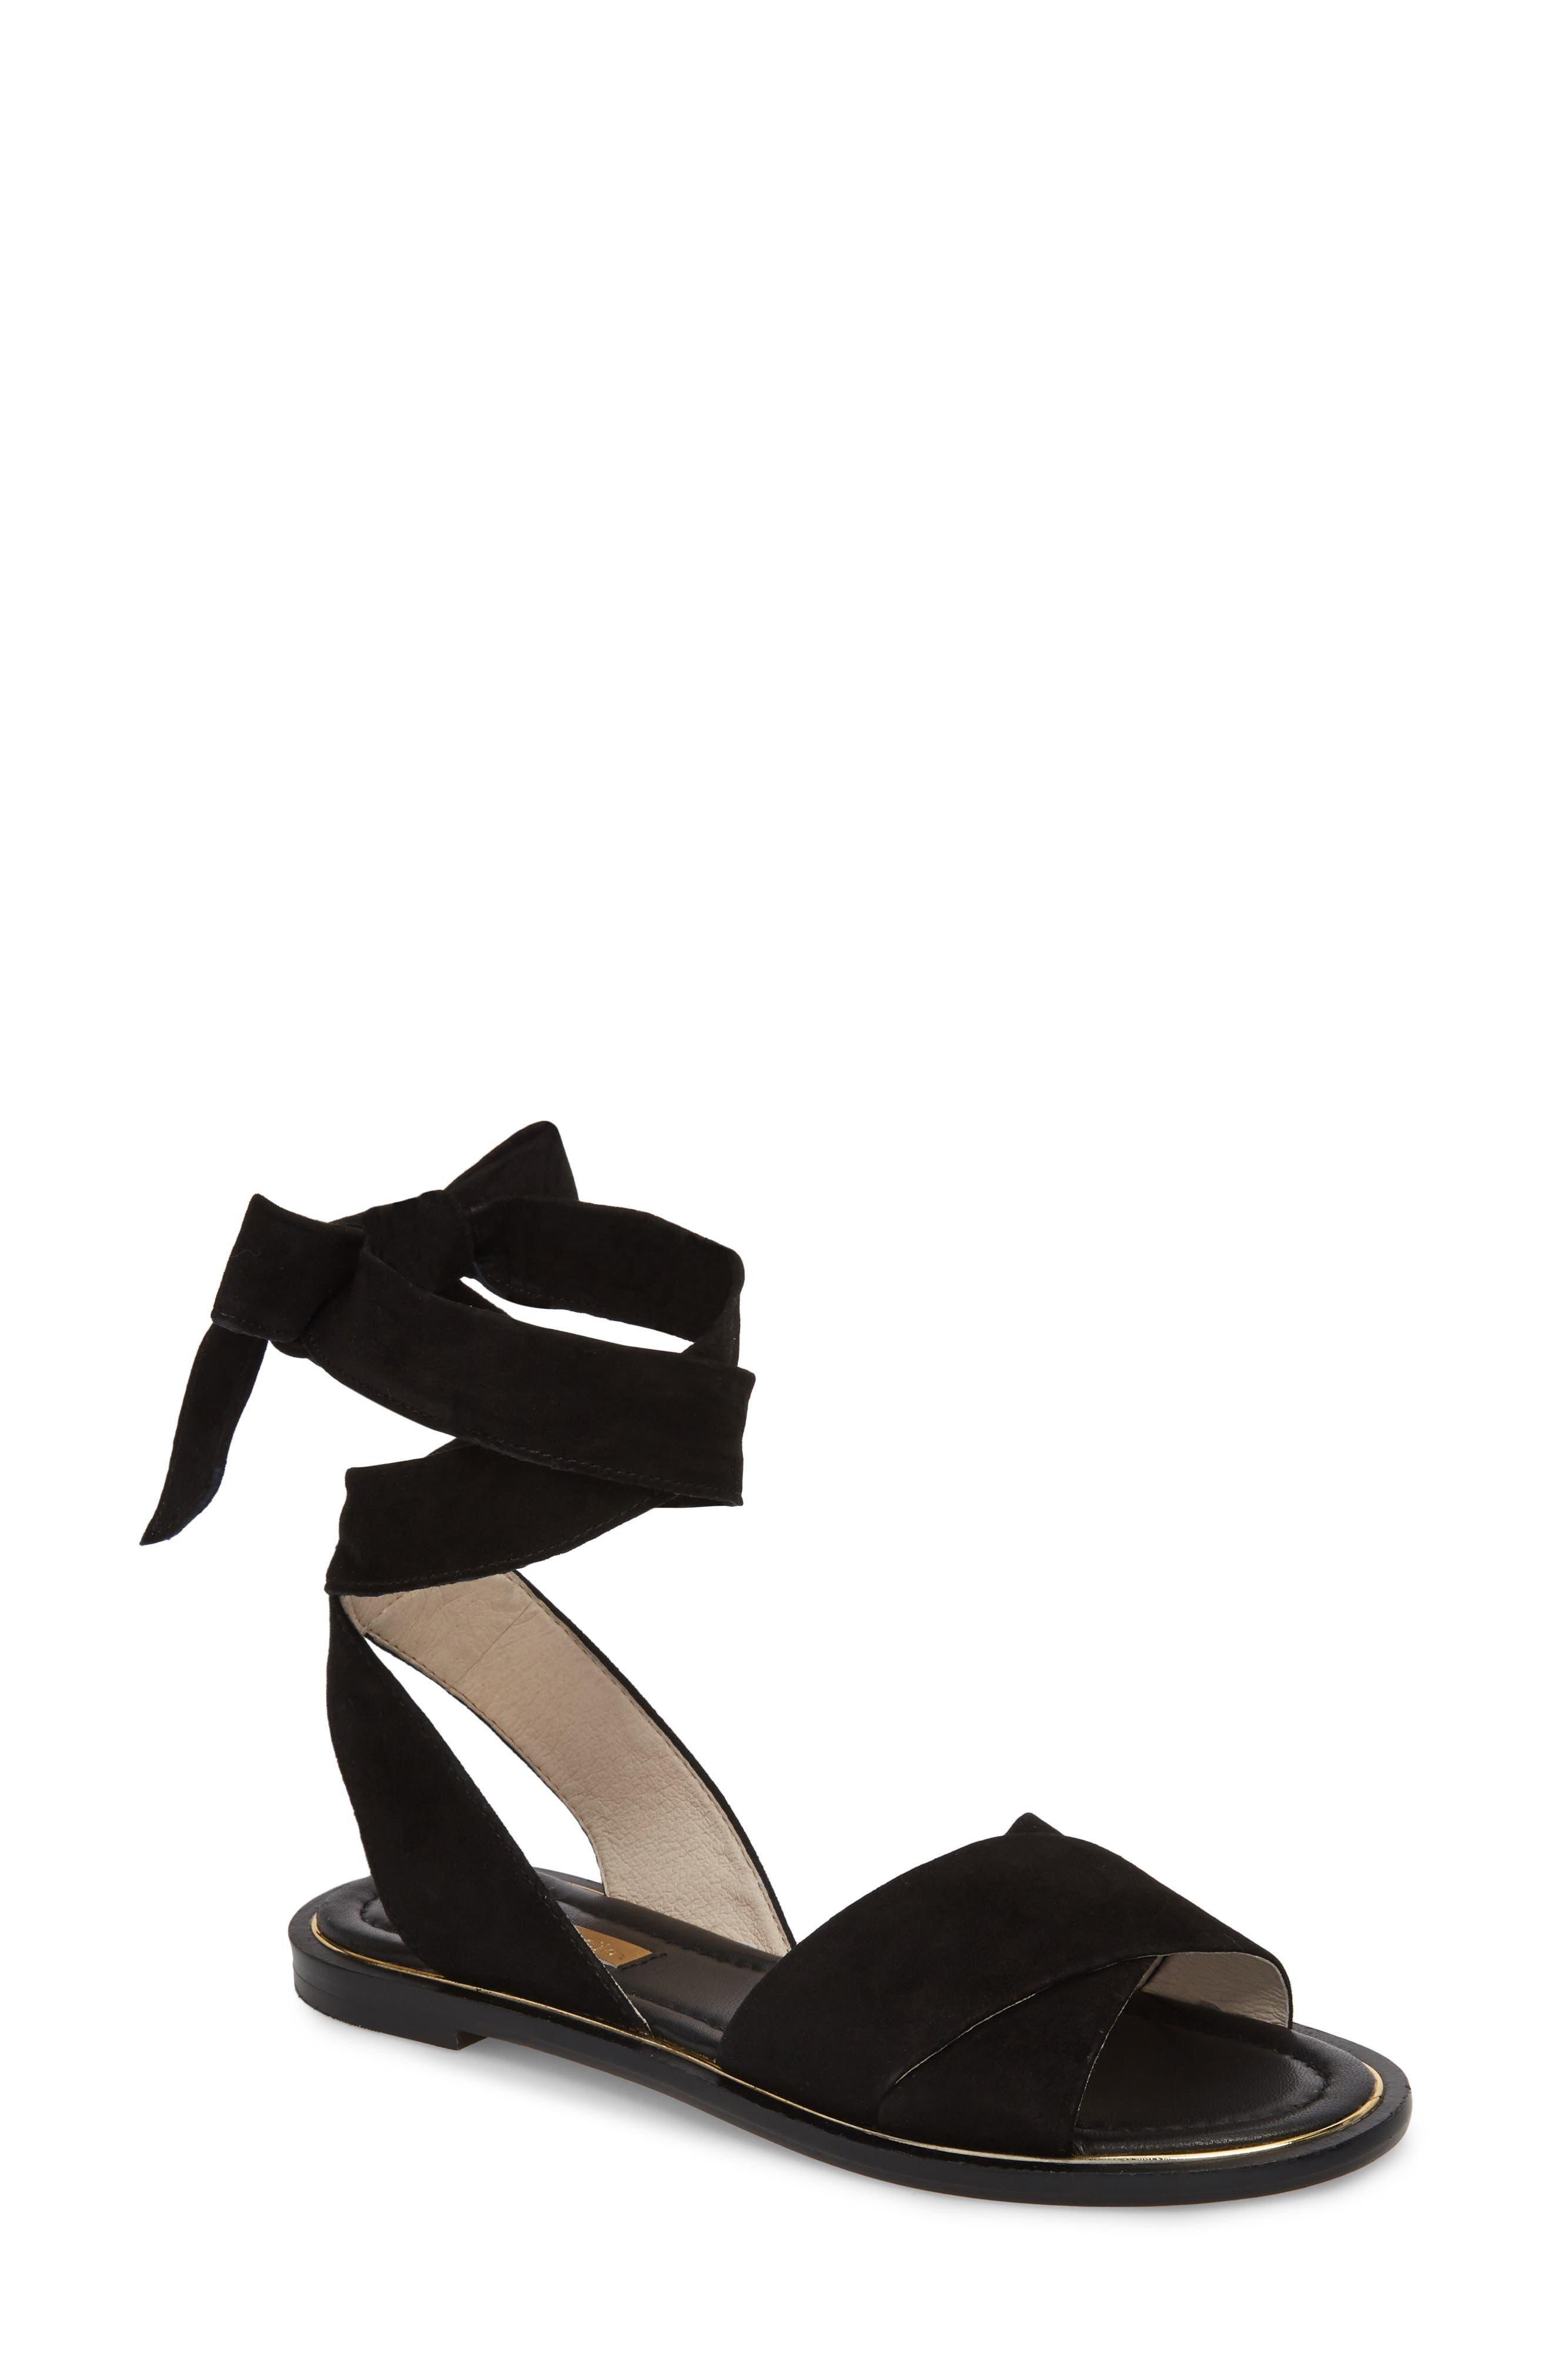 Biglia Ankle Wrap Sandal,                         Main,                         color, Black Leather